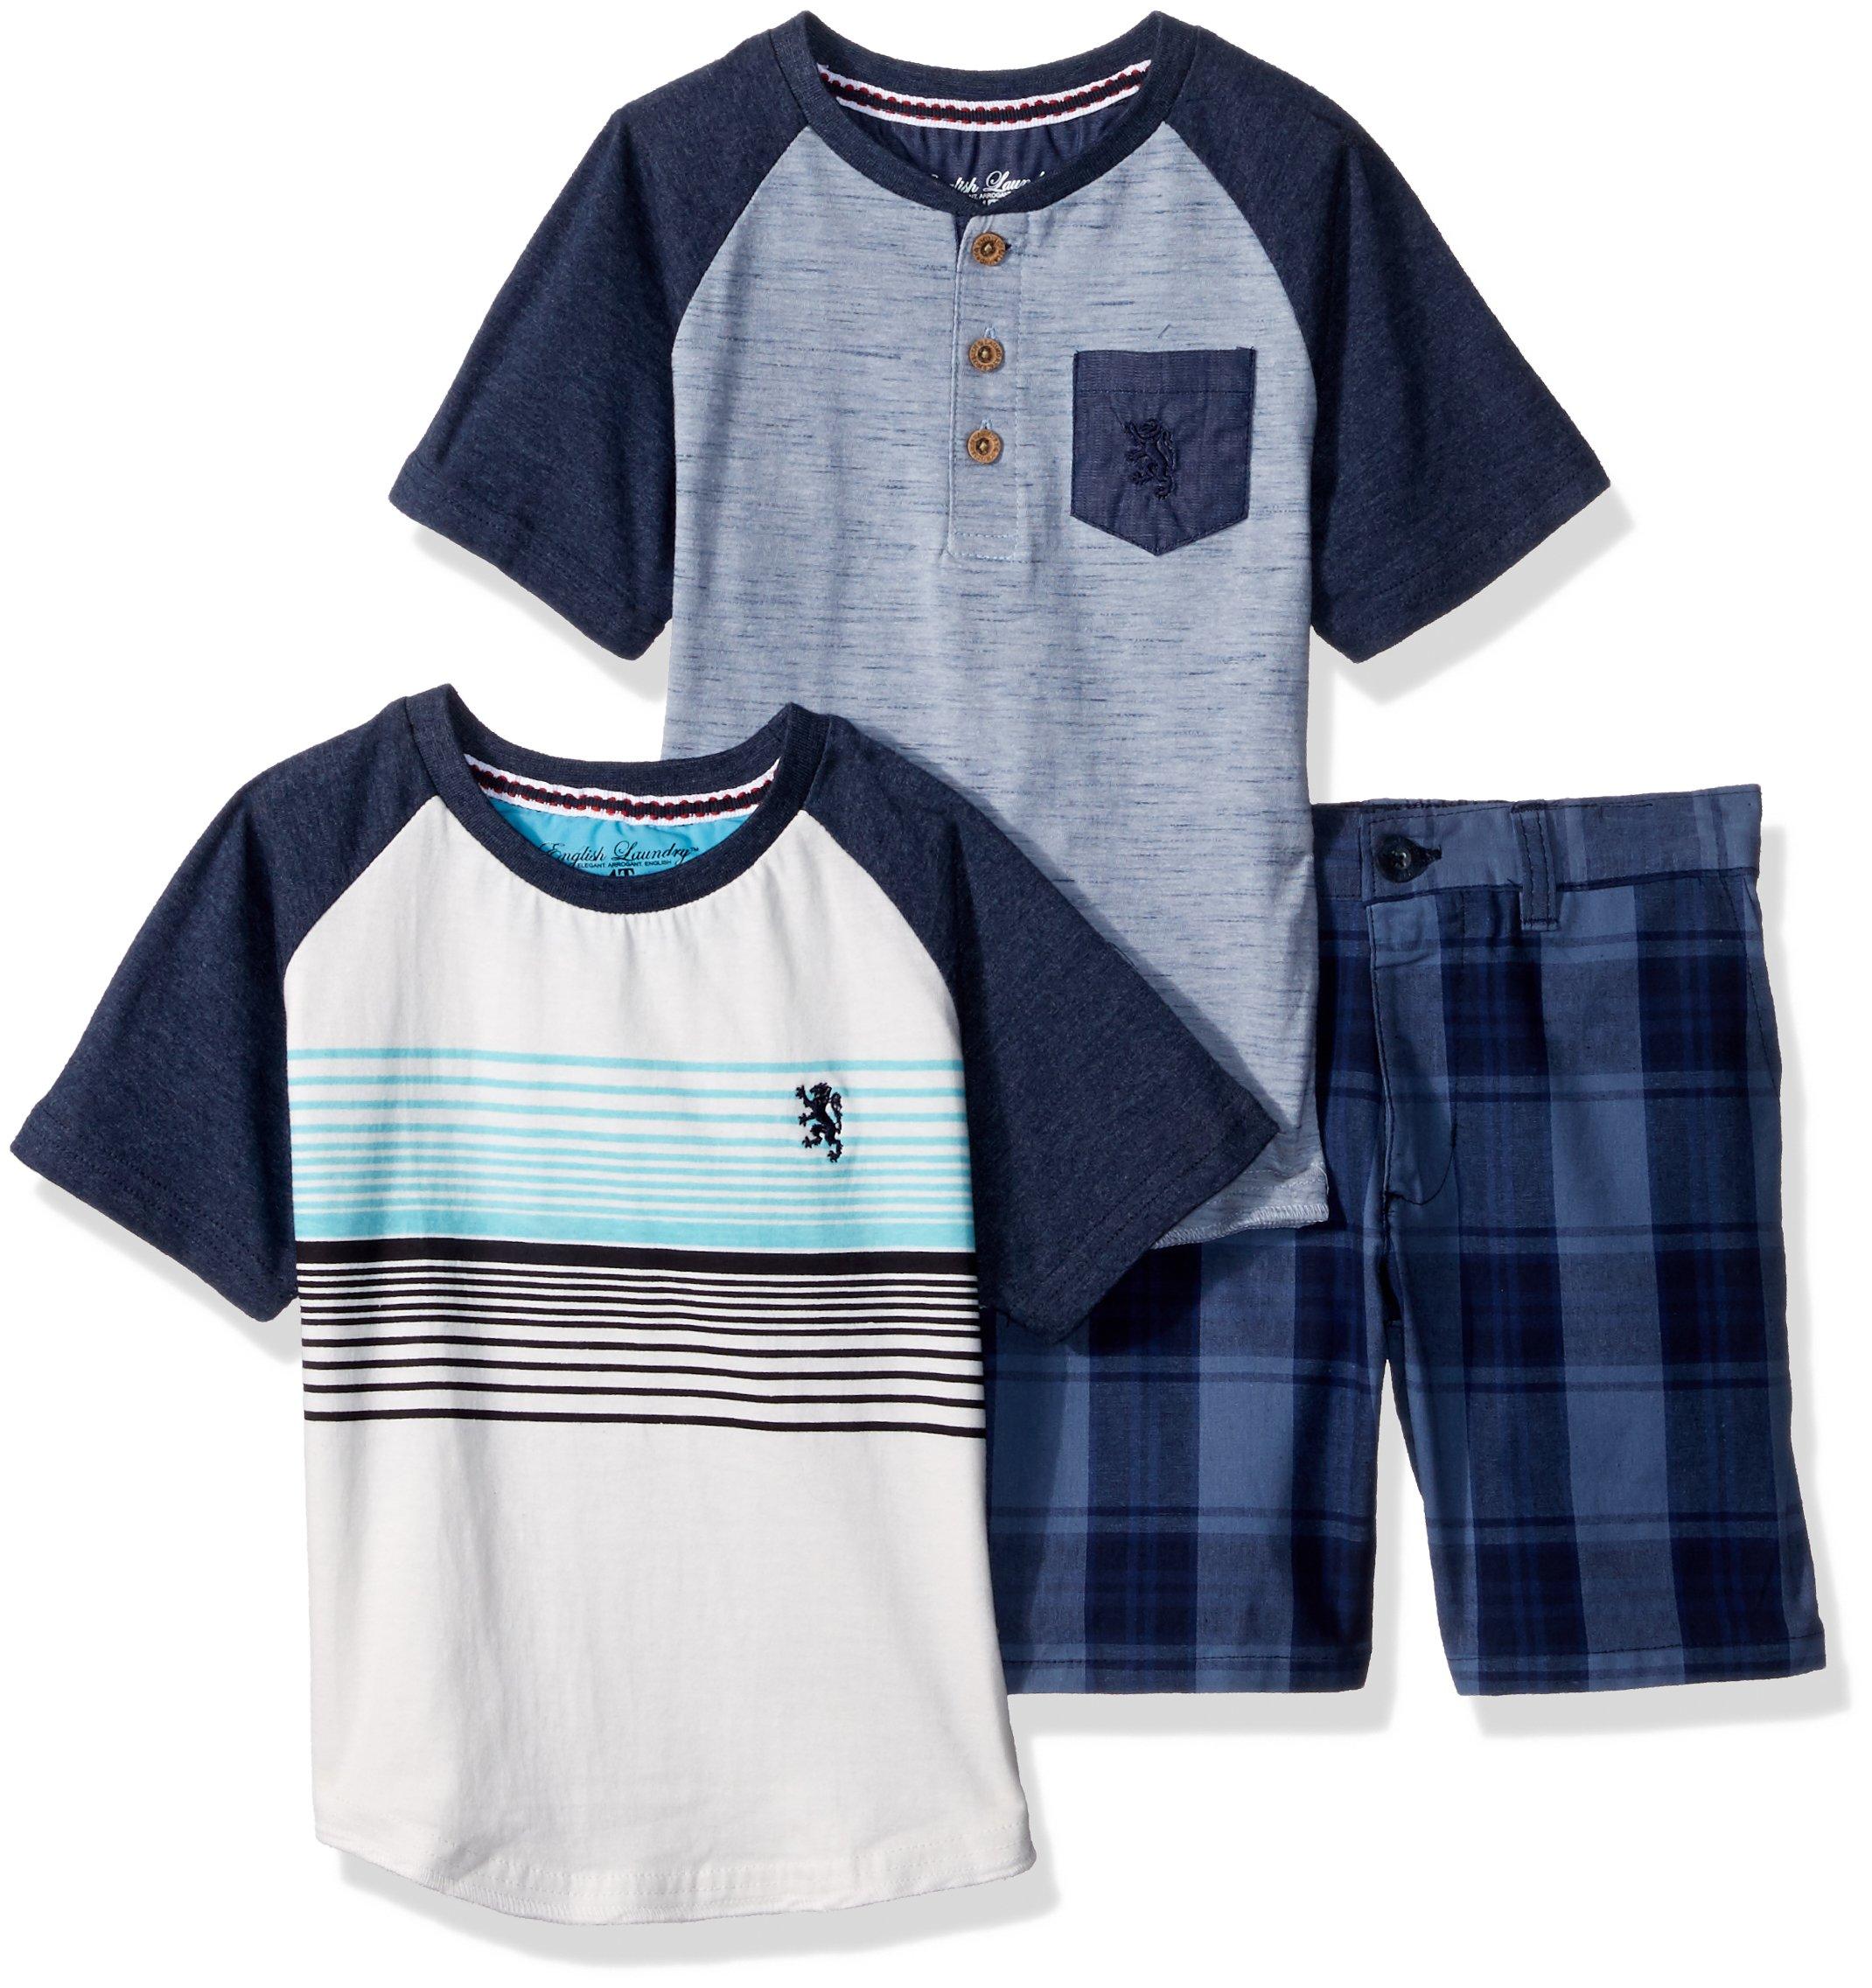 English Laundry Toddler Boys' Sleeve Henley, Raglan Tee and Plaid Short, Multi Plaid, 2T